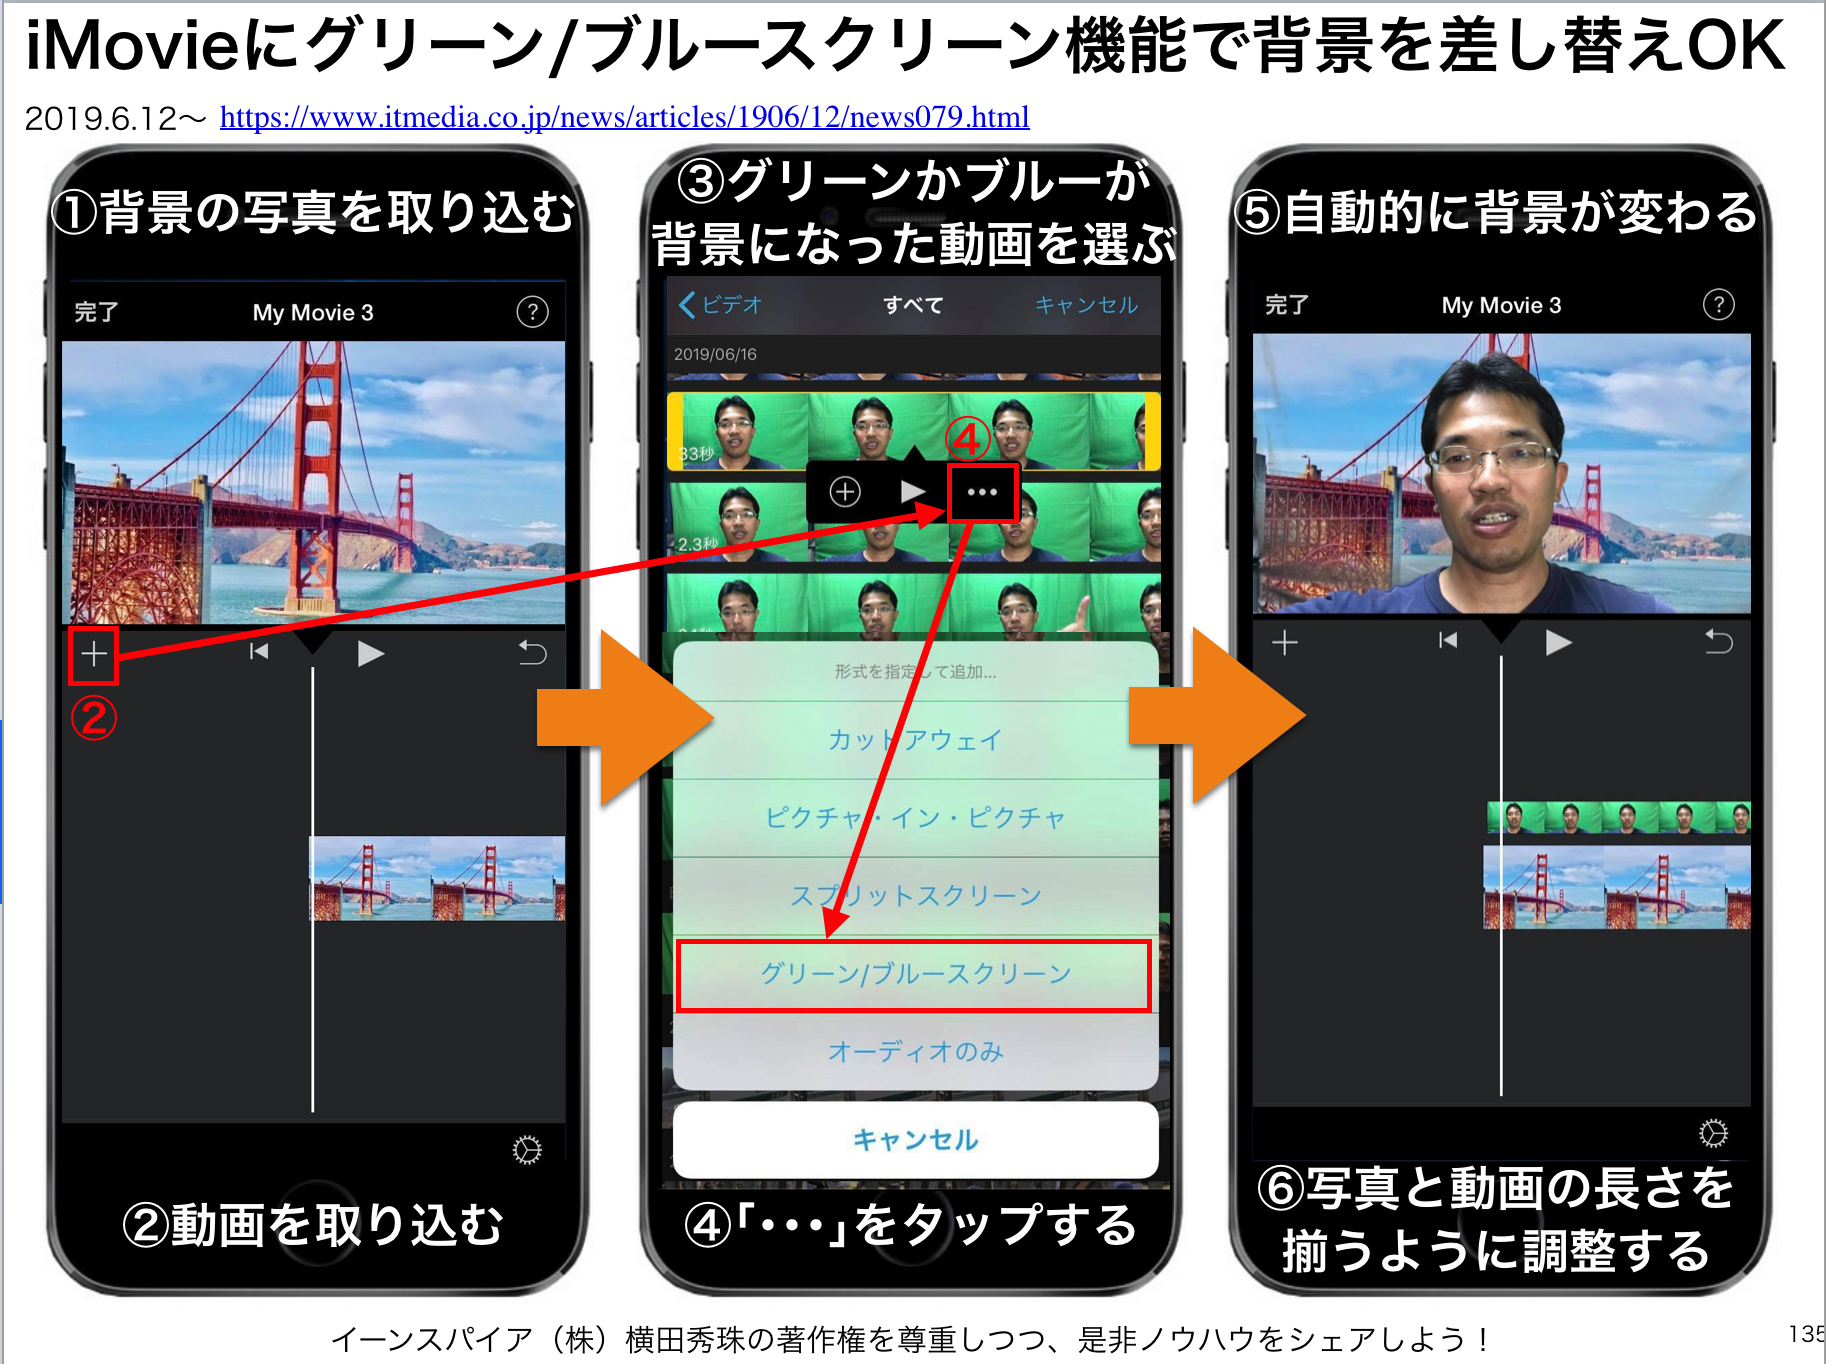 iMovieのグリーン/ブルースクリーン機能で背景が変えられる